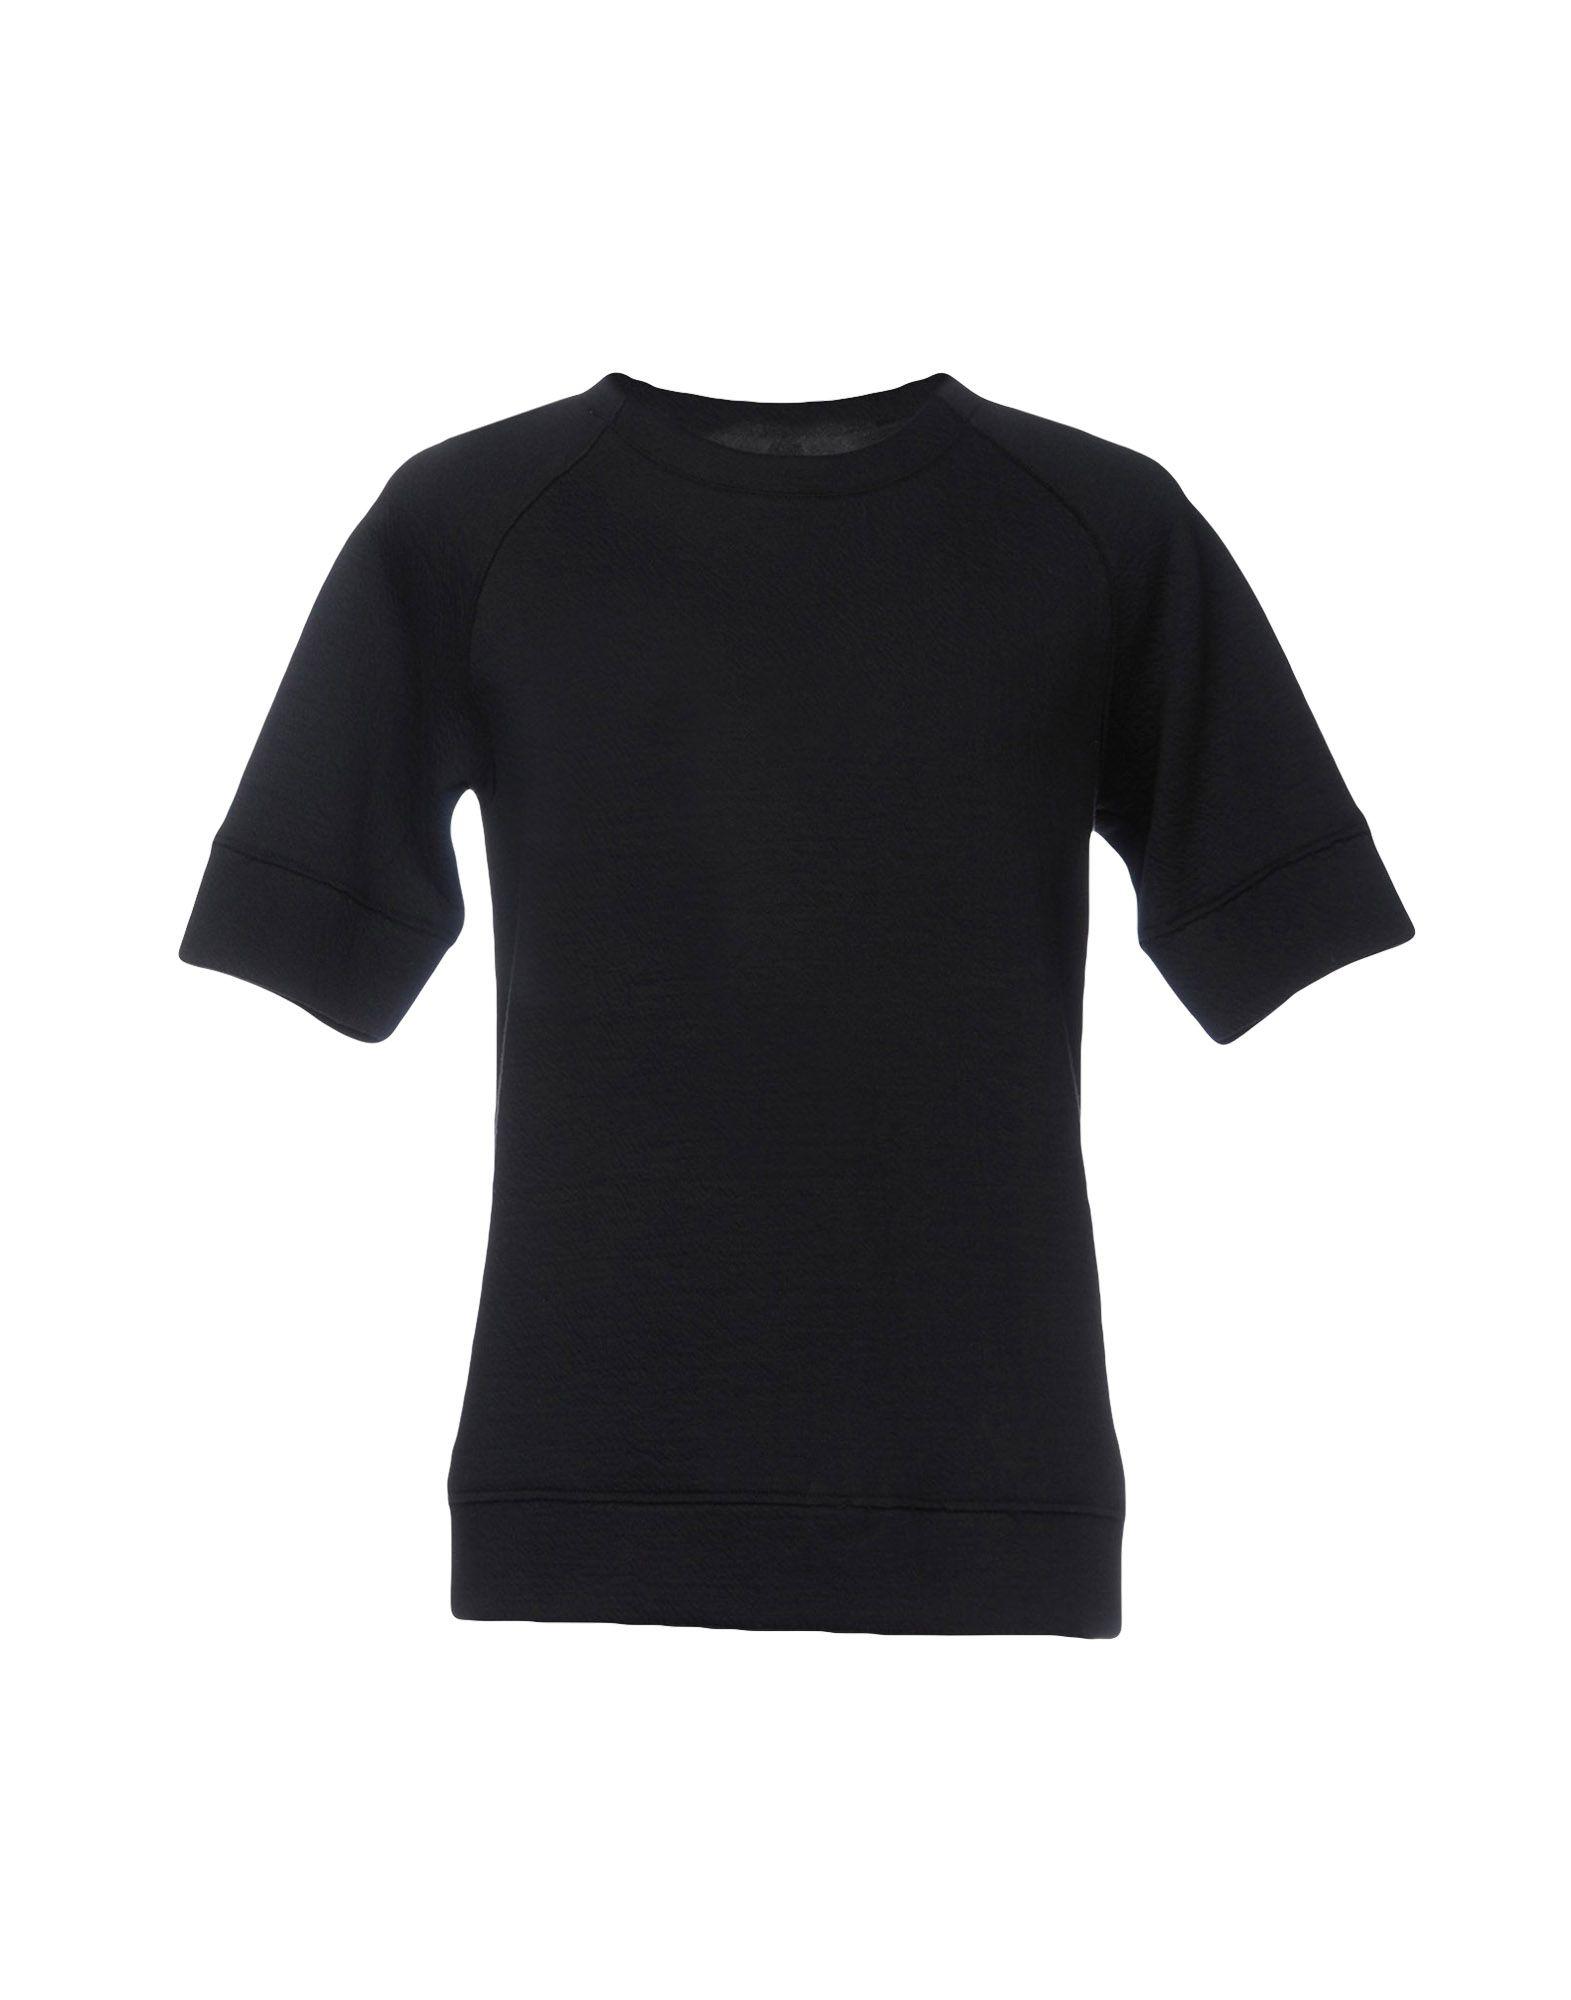 ALEXANDRE PLOKHOV Sweatshirt in Black